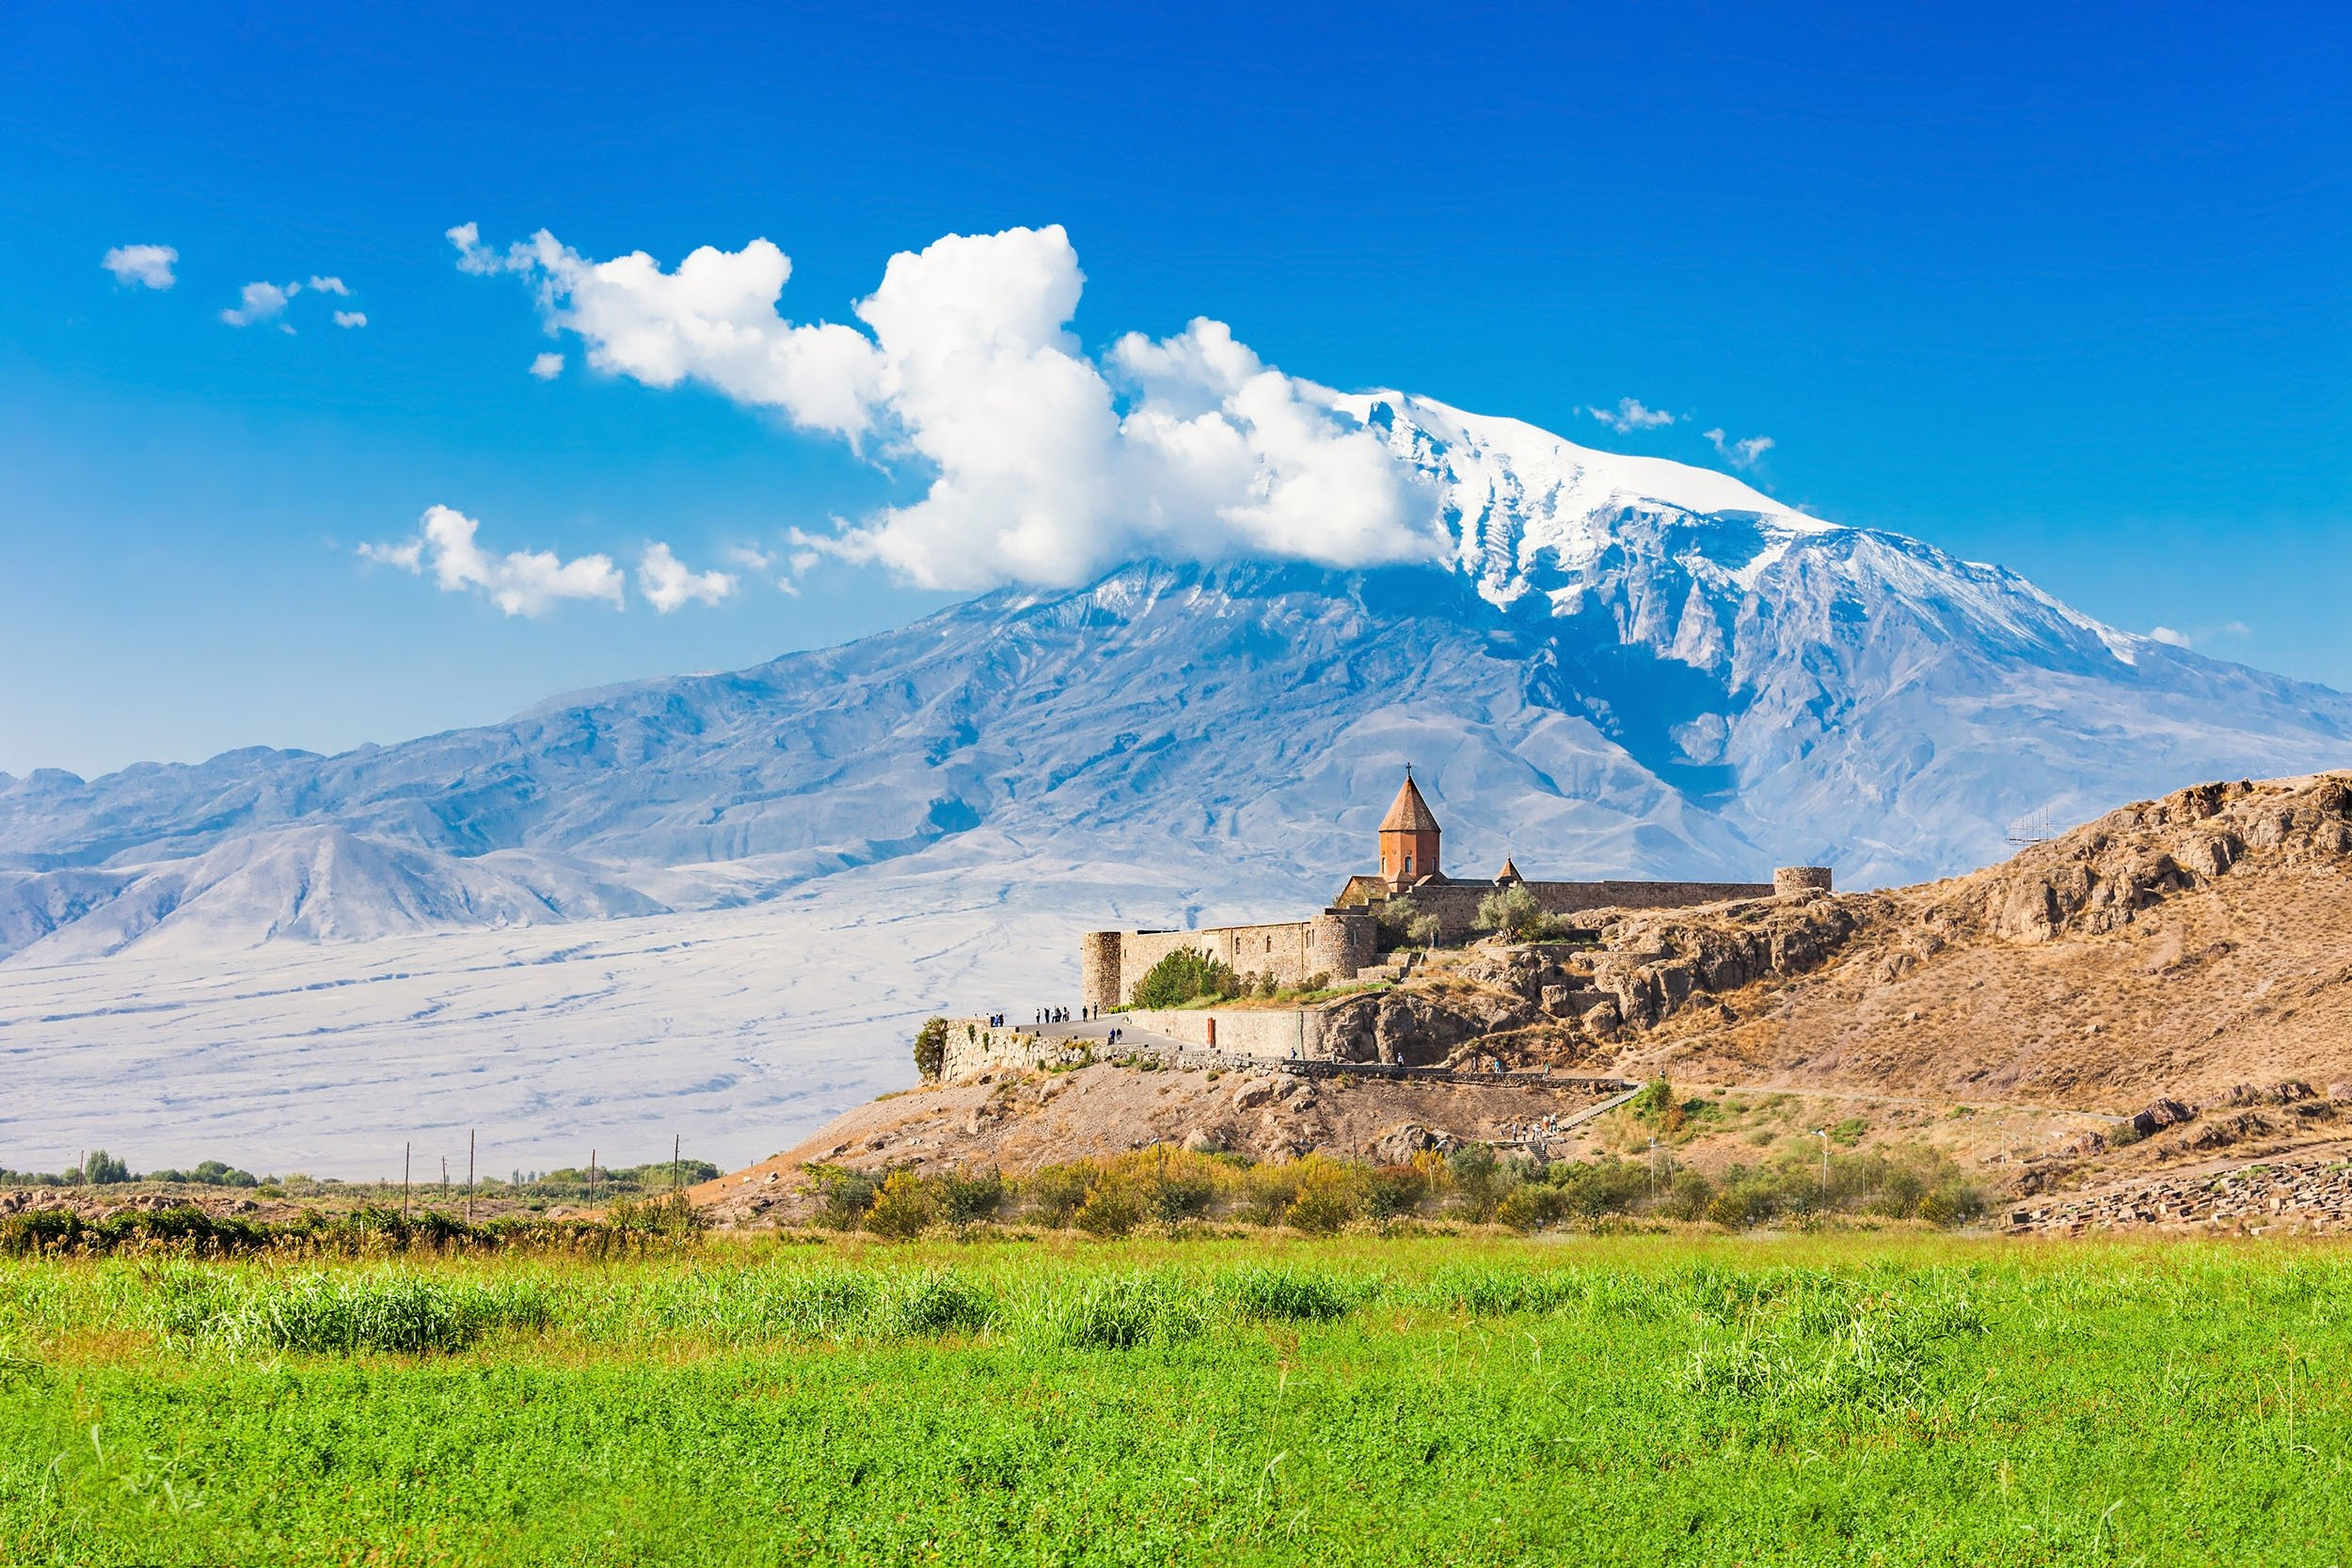 Armenian Monastery Khor Virap with Mount Ararat in the background, in the Ararat plain, Armenia. (Shutterstock Photo)